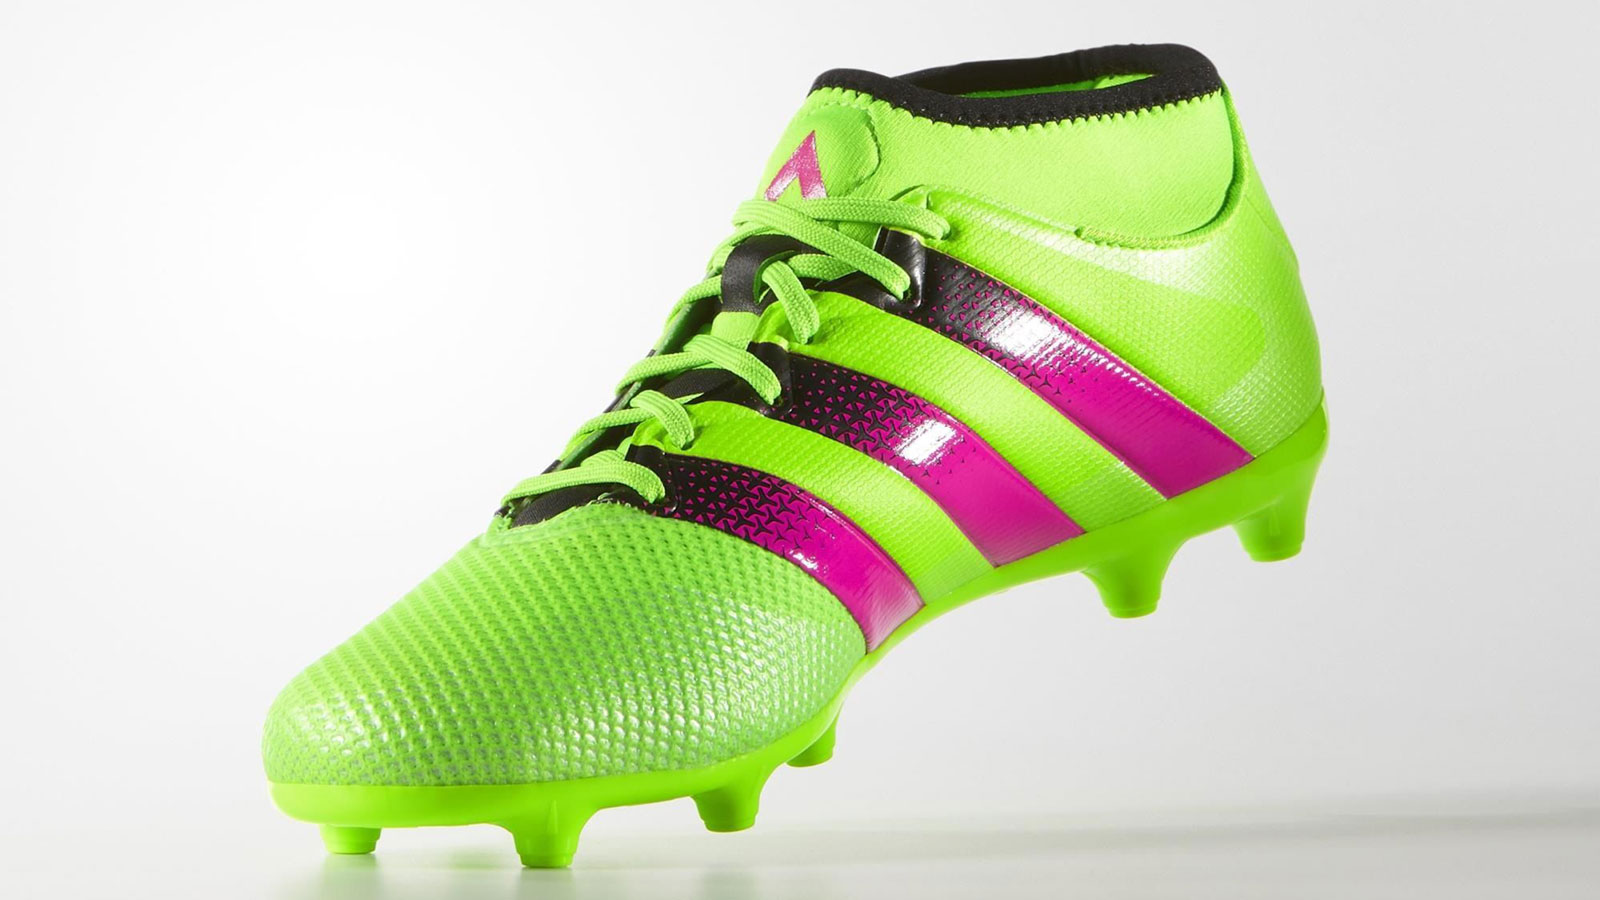 Adidas Ace 16+ Primeknit FG Schuhe kaufen. Adidas Fußballschuhe Ace 2016/2017